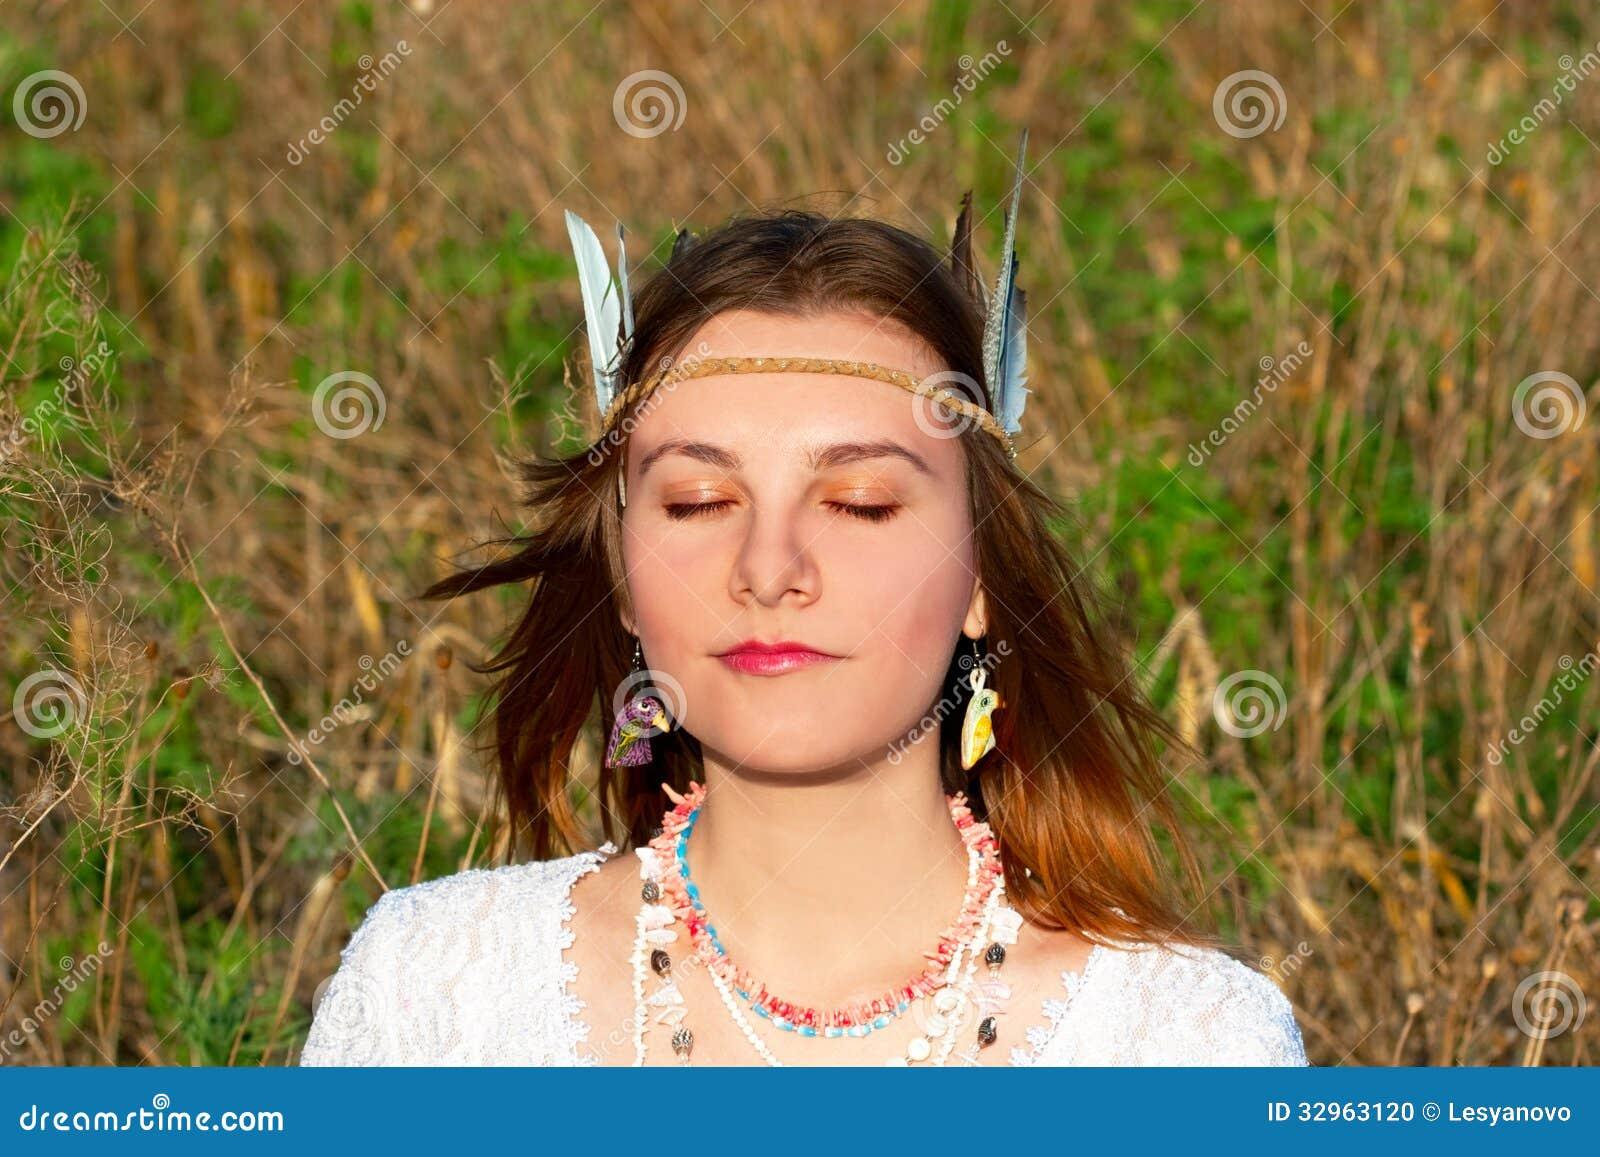 Mujer joven con beautifications indios